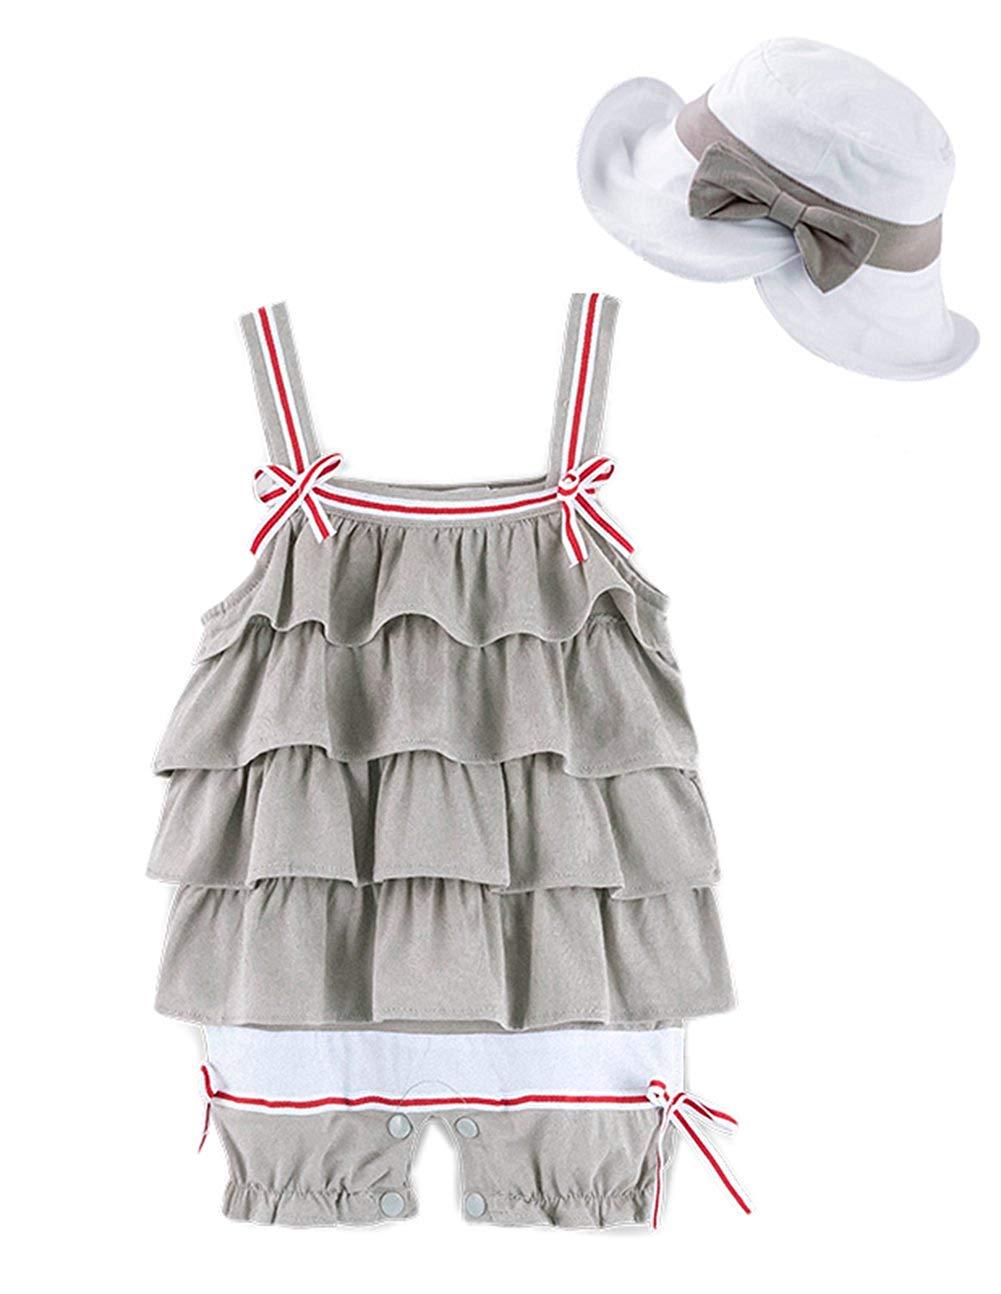 7b772e7fb Get Quotations · stylesilove Baby Girl Ruffle Layered Sleeveless Cotton  Romper and Hat 2 pcs Set